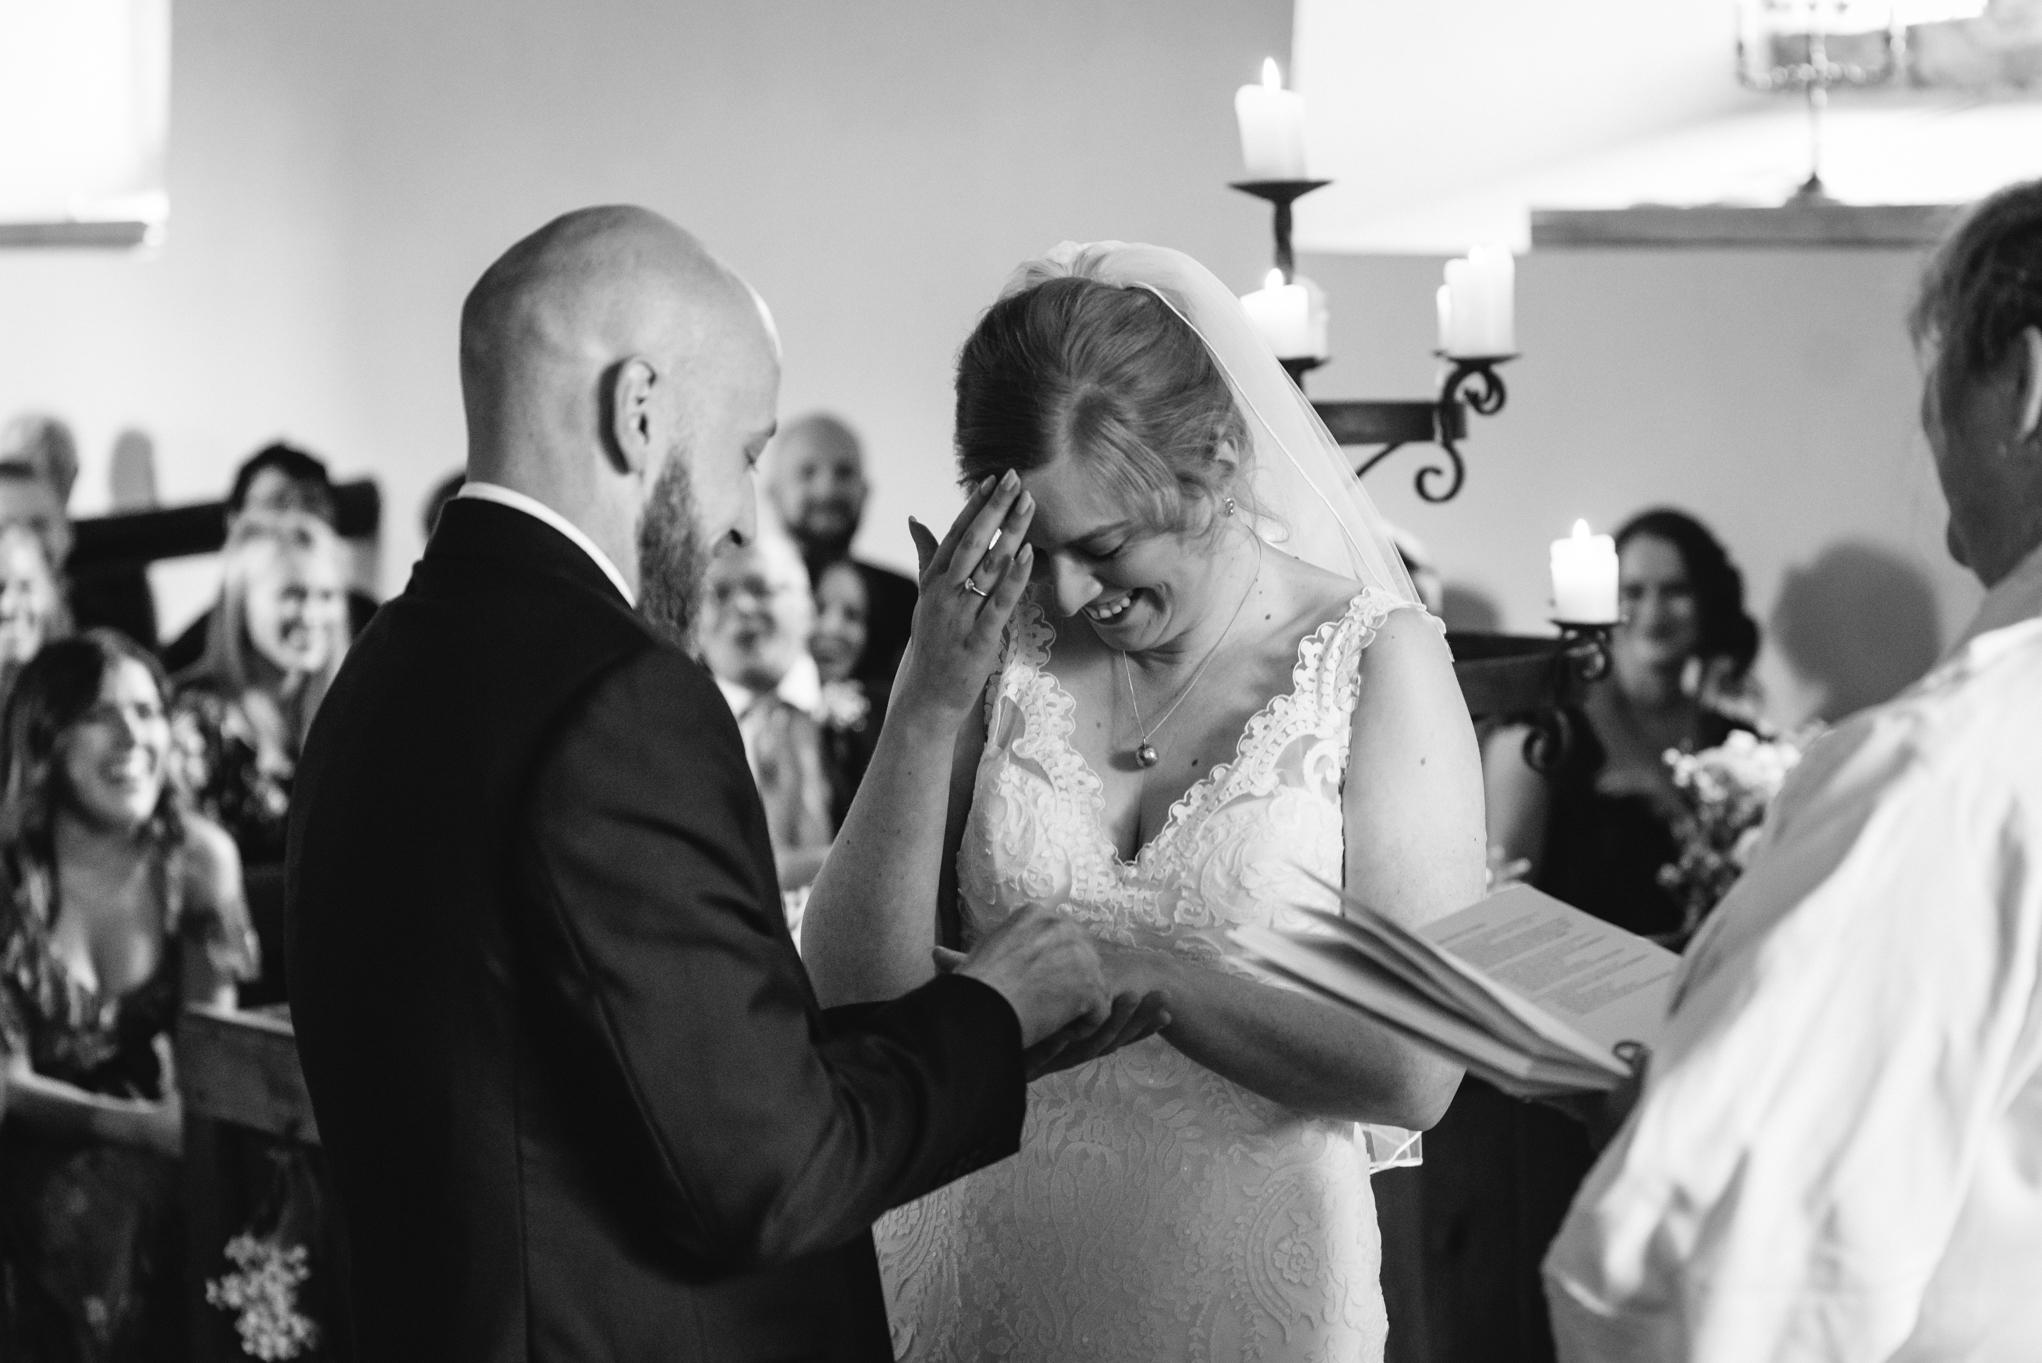 Bride & Groom at altar during wedding - Powys Wedding Photography